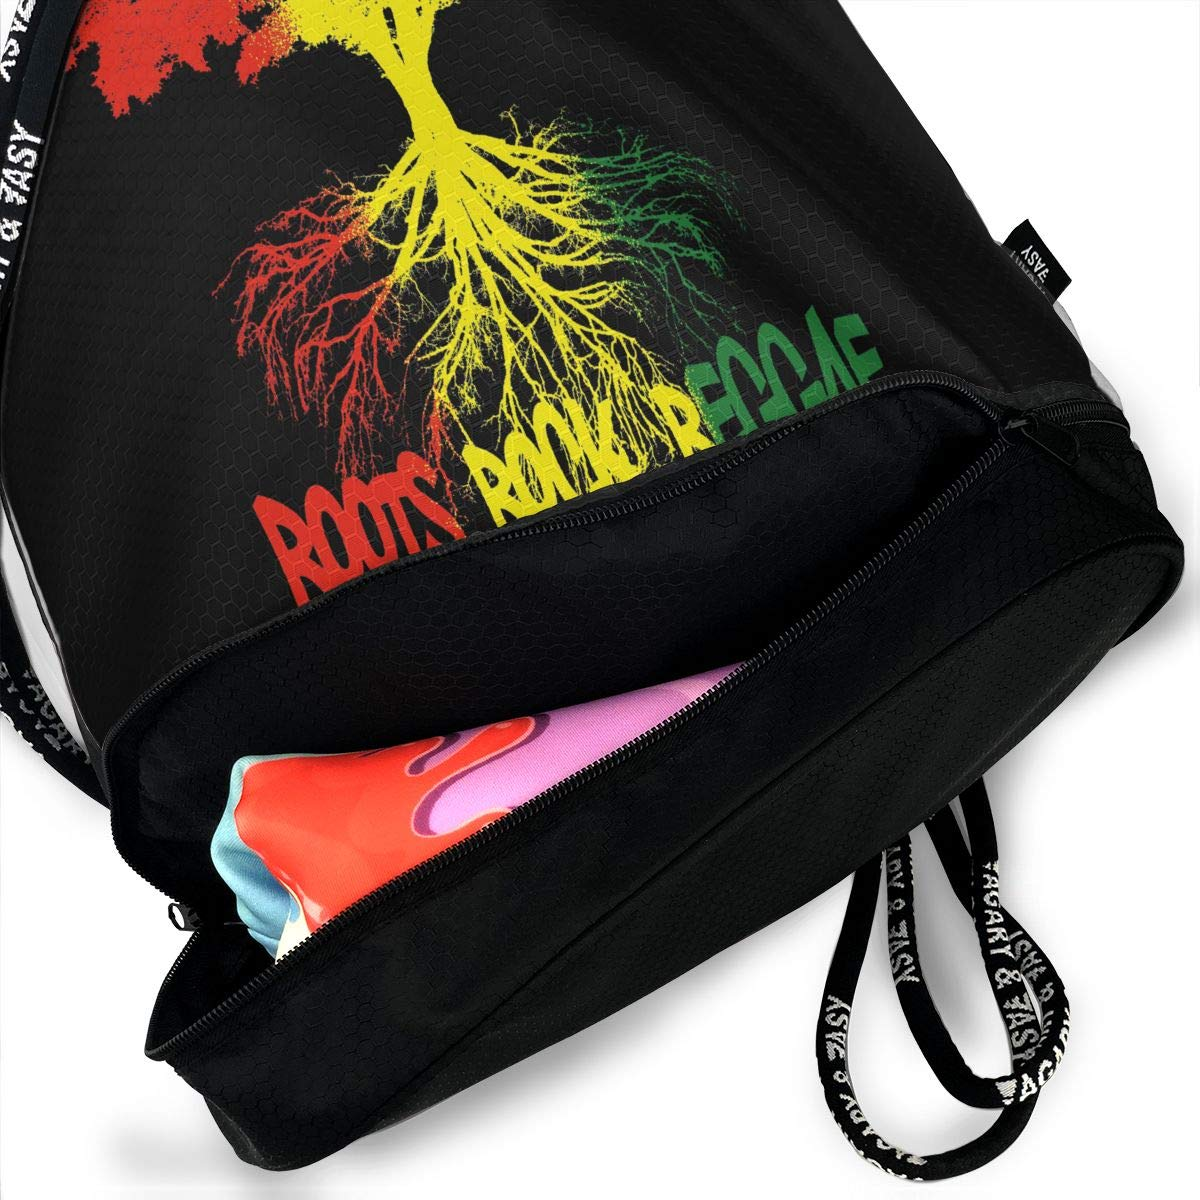 HFTIDBC Endless Summer of Roots Reggae Gym Bags Drawstring Backpack Sackpack